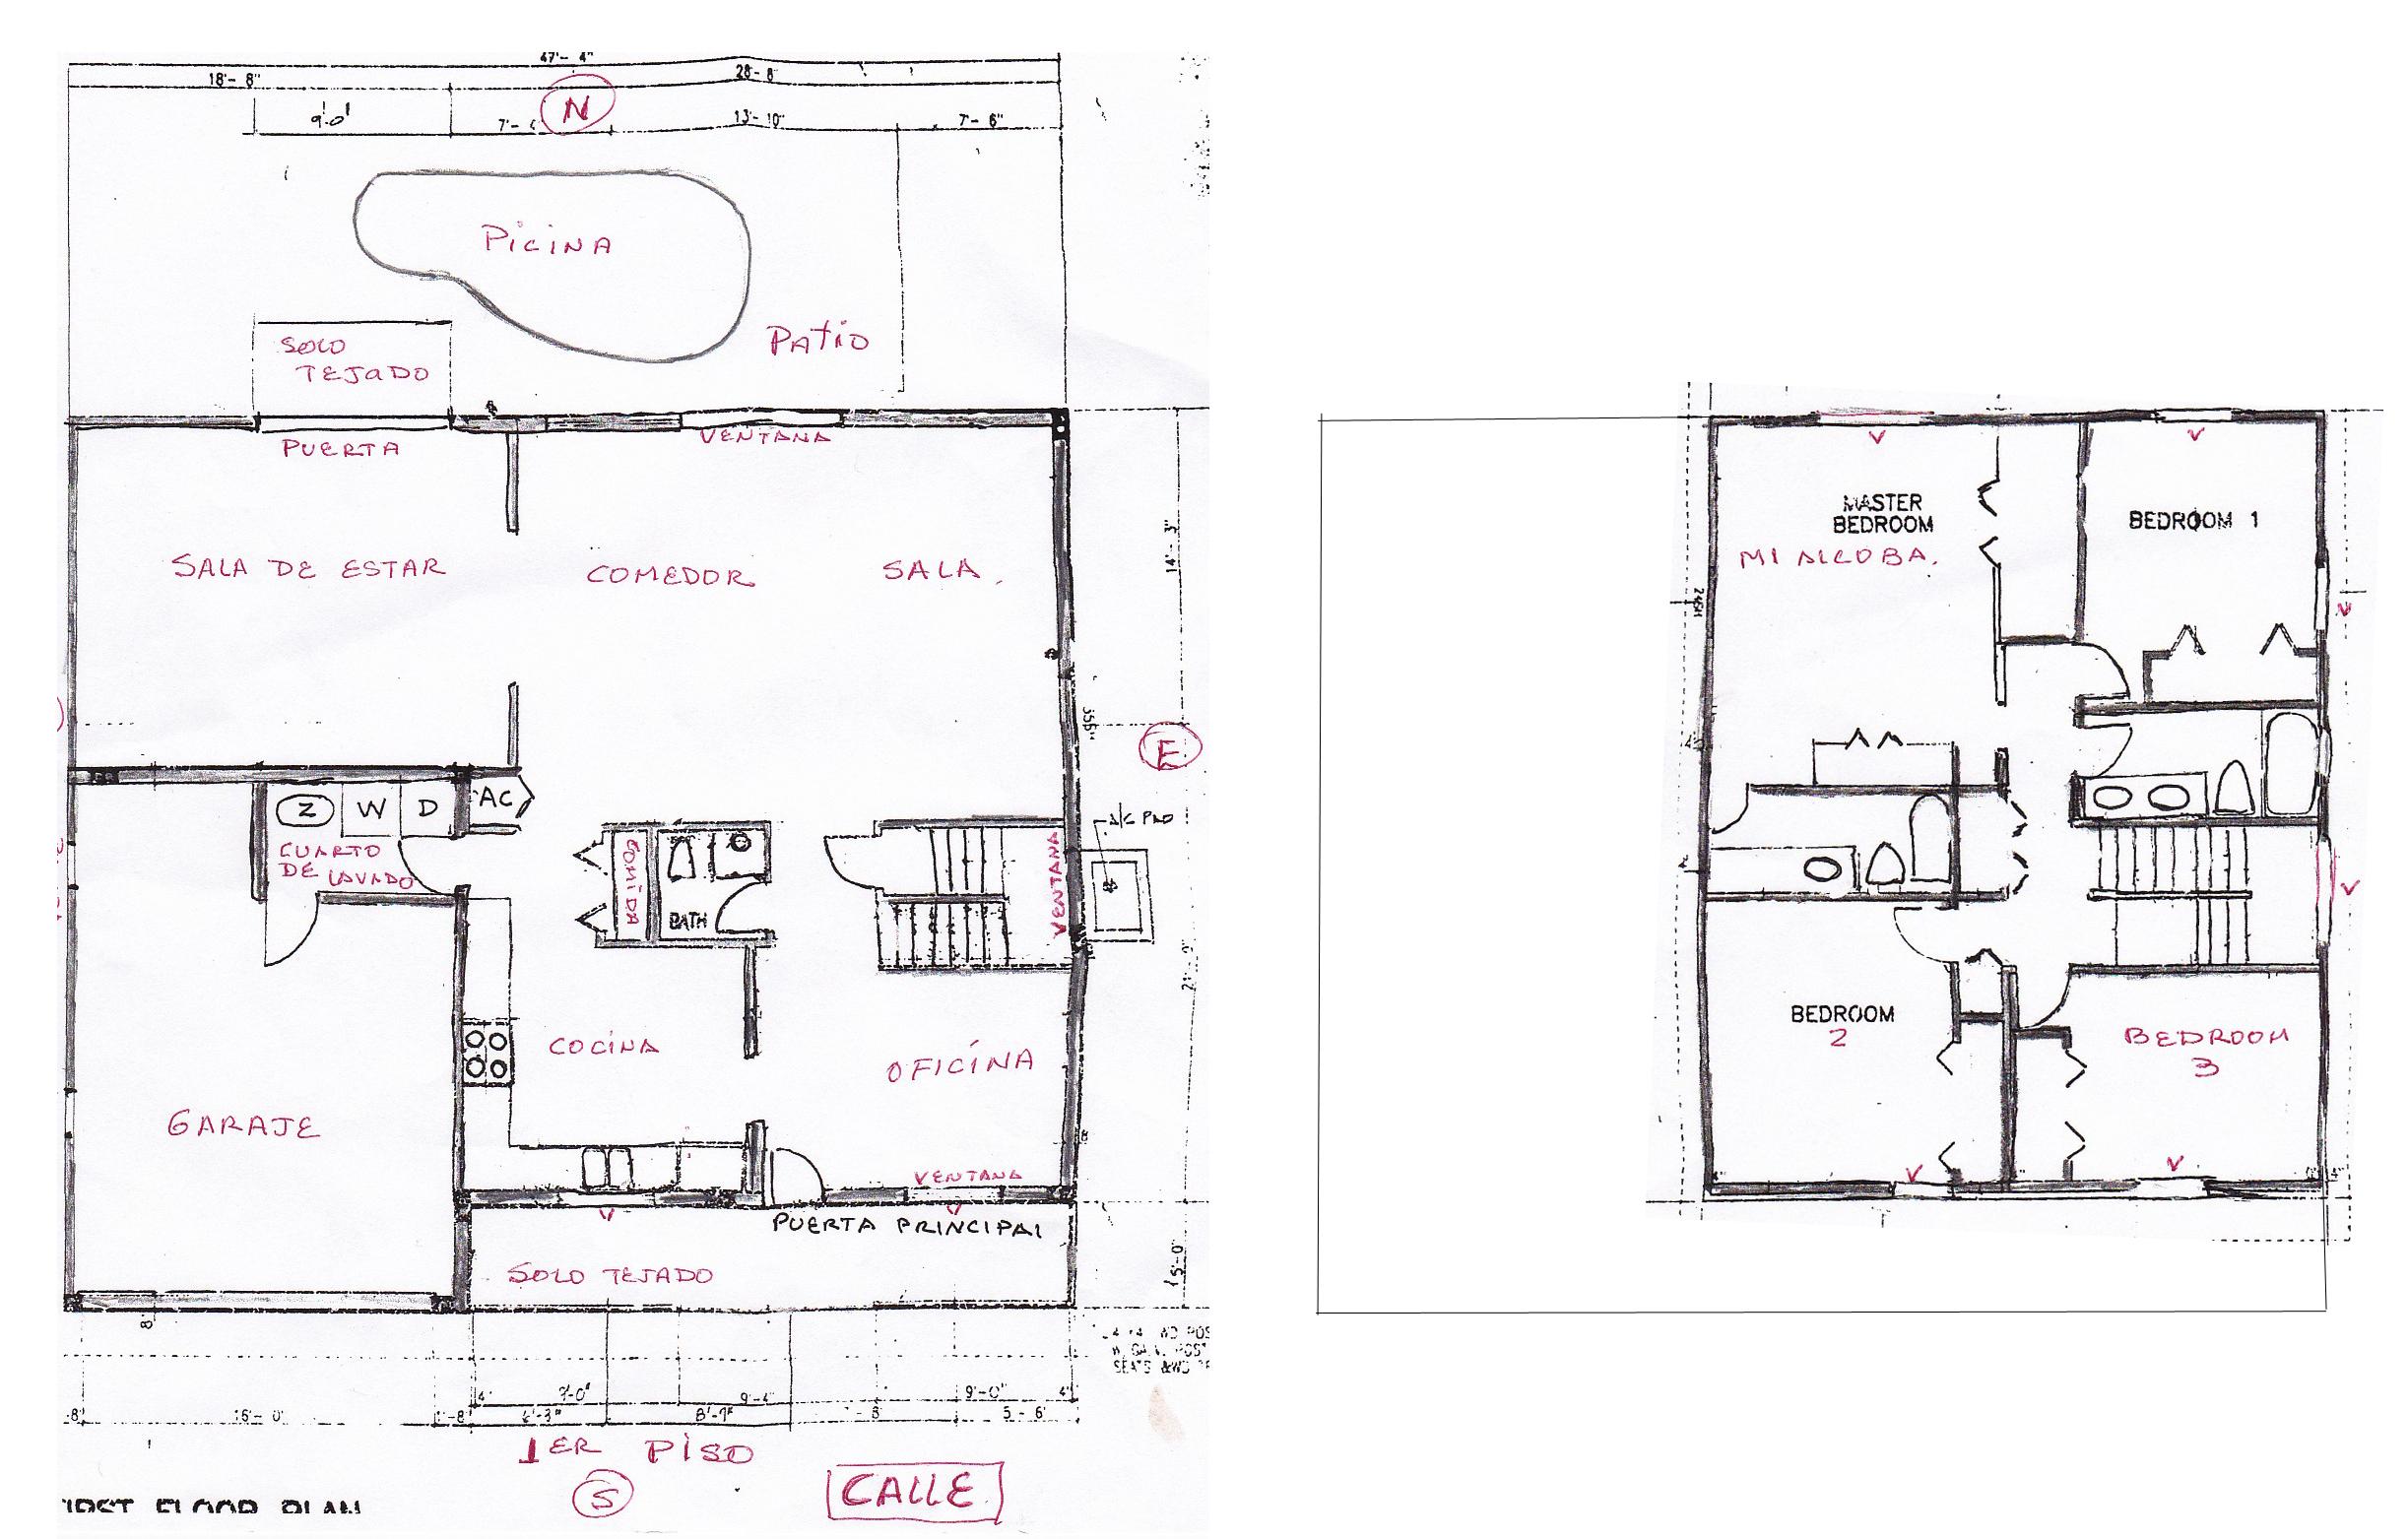 Casa feng shui el blog de feng shui y arquitectura for Casas feng shui arquitectura